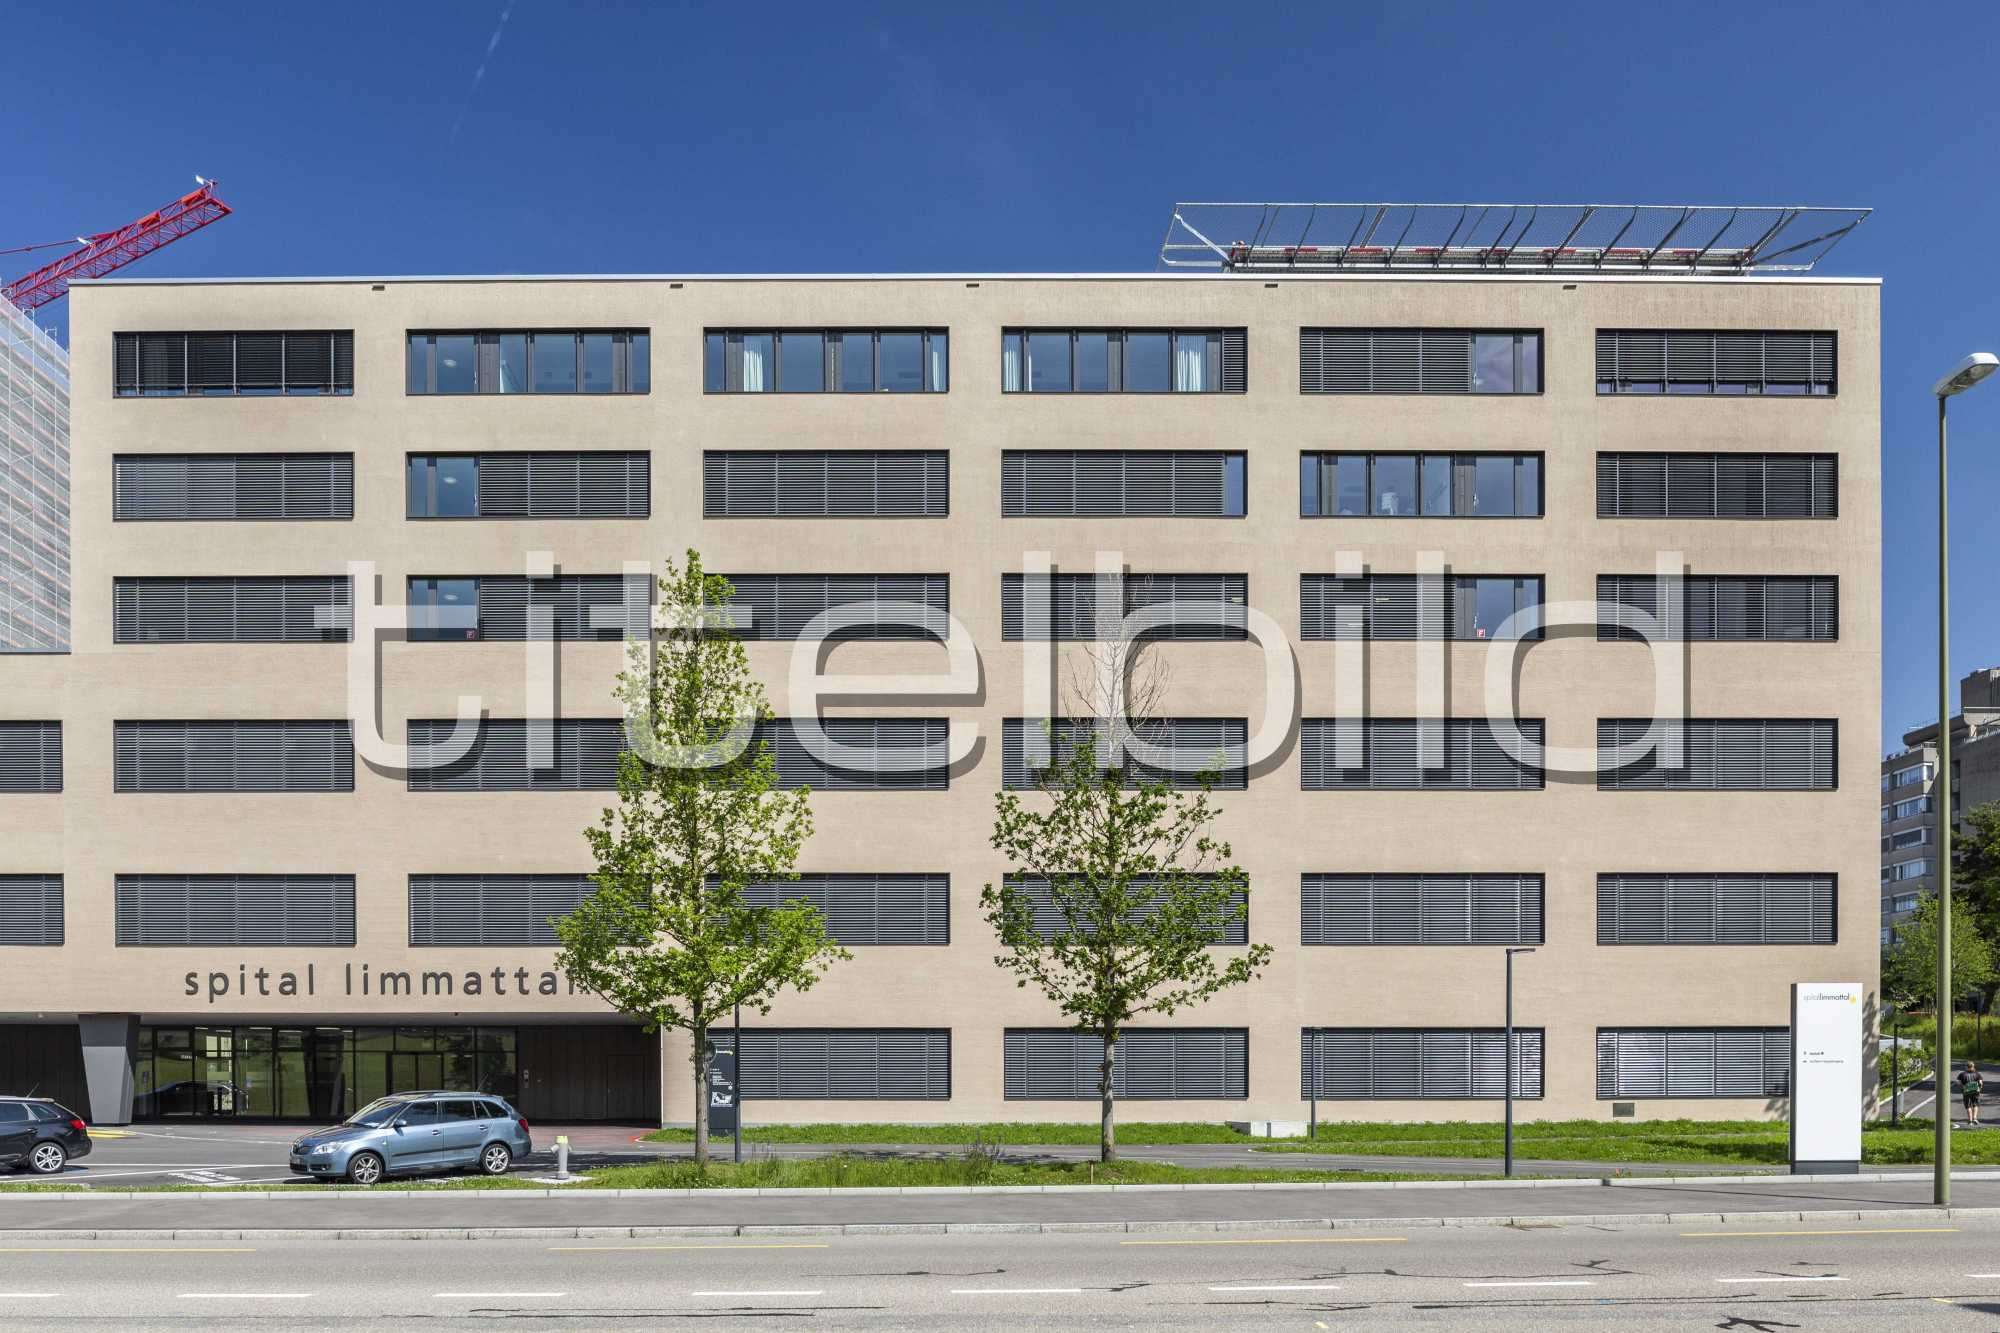 Projektbild-Nr. 11: LimmiViva Spital Limmattal